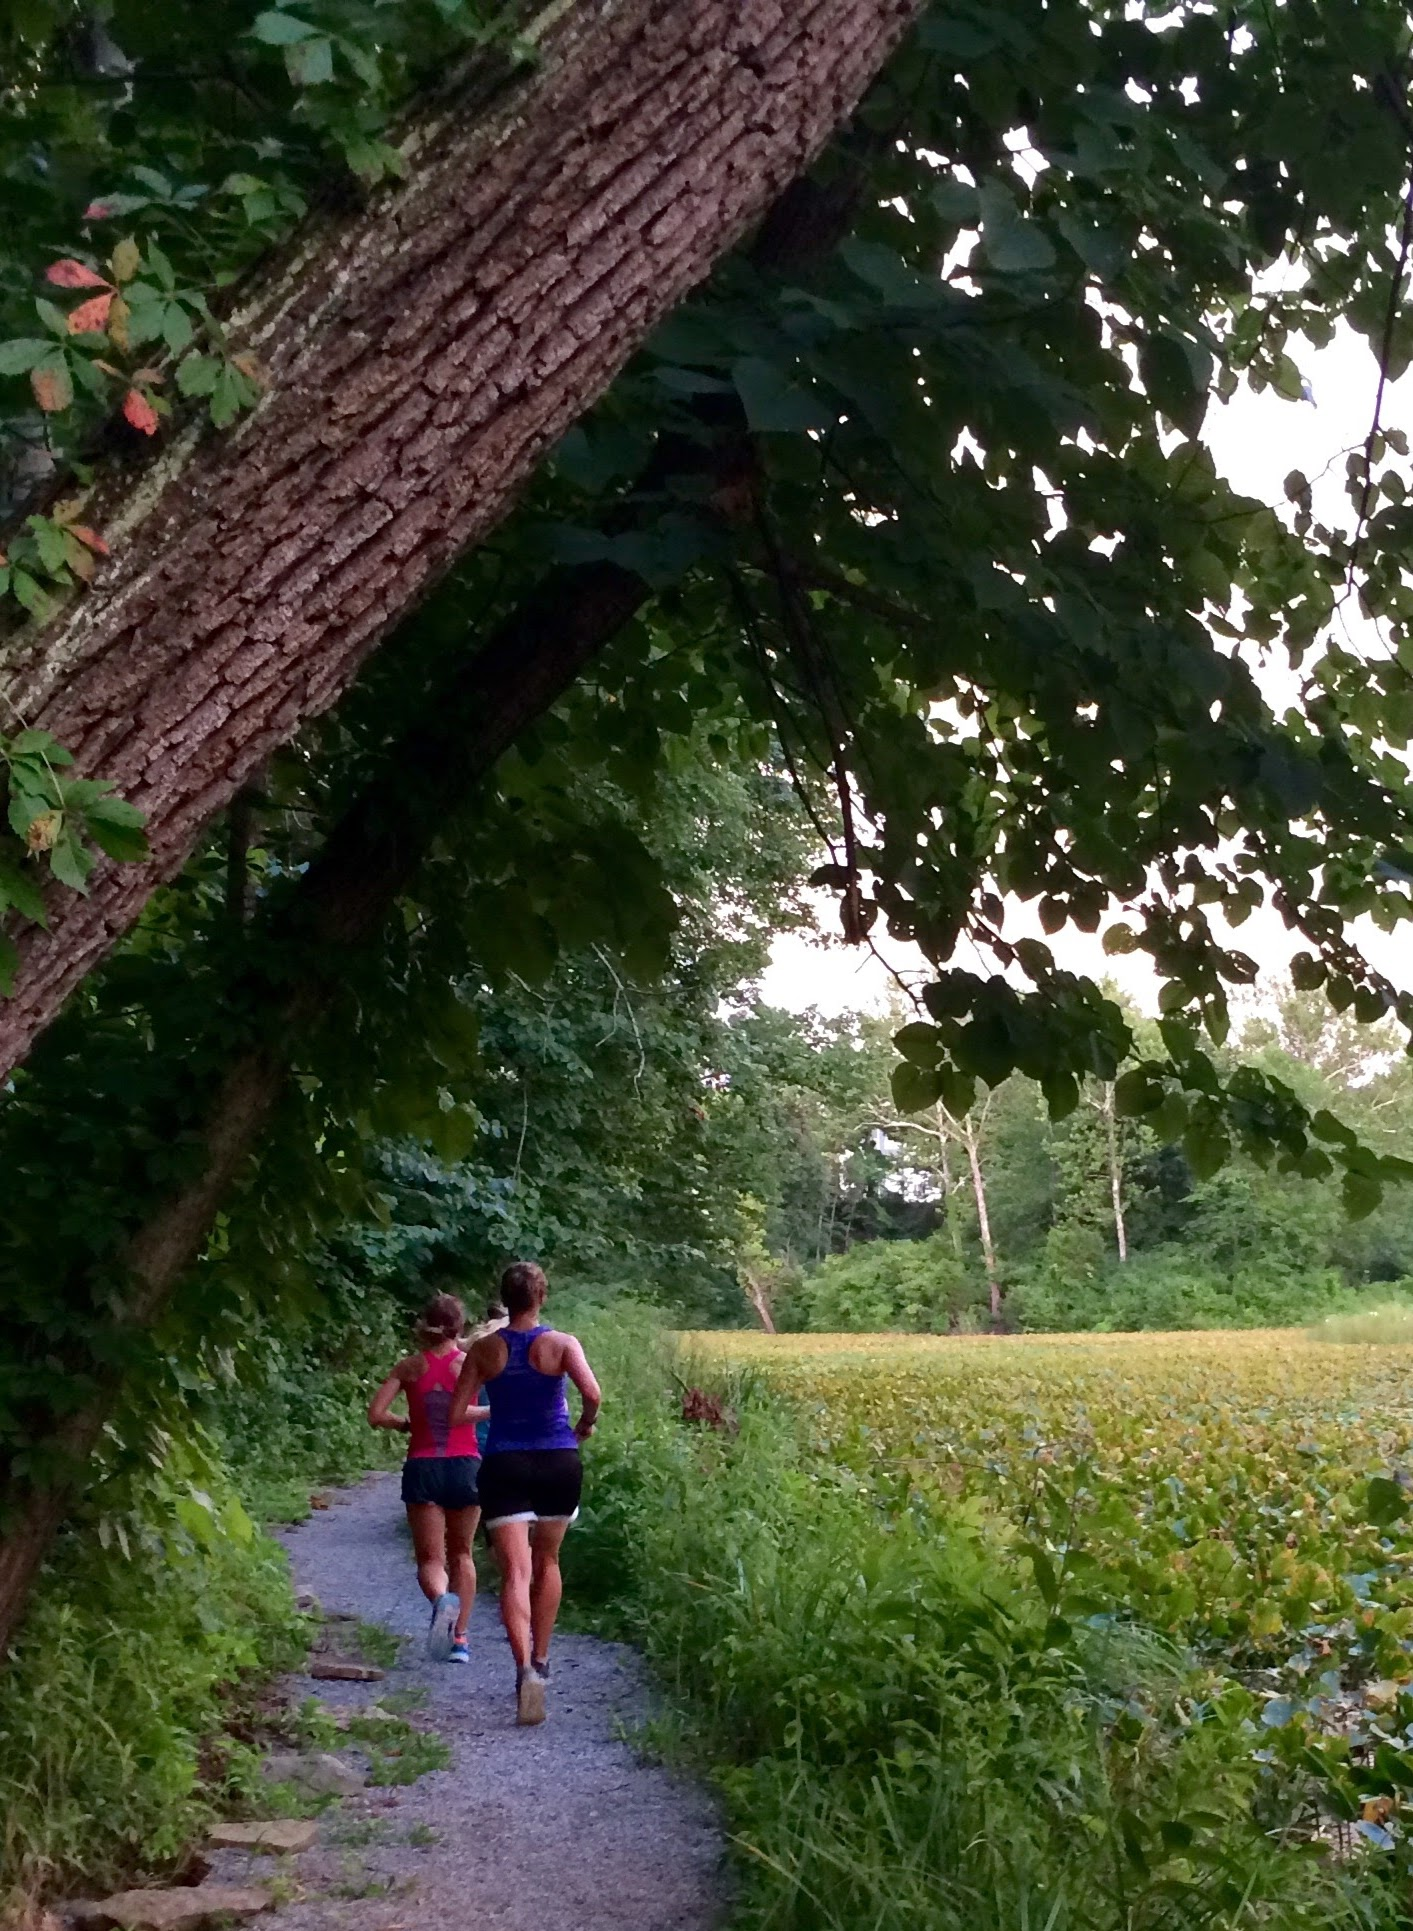 runners injury trail running tips running coach shelly Minnesota